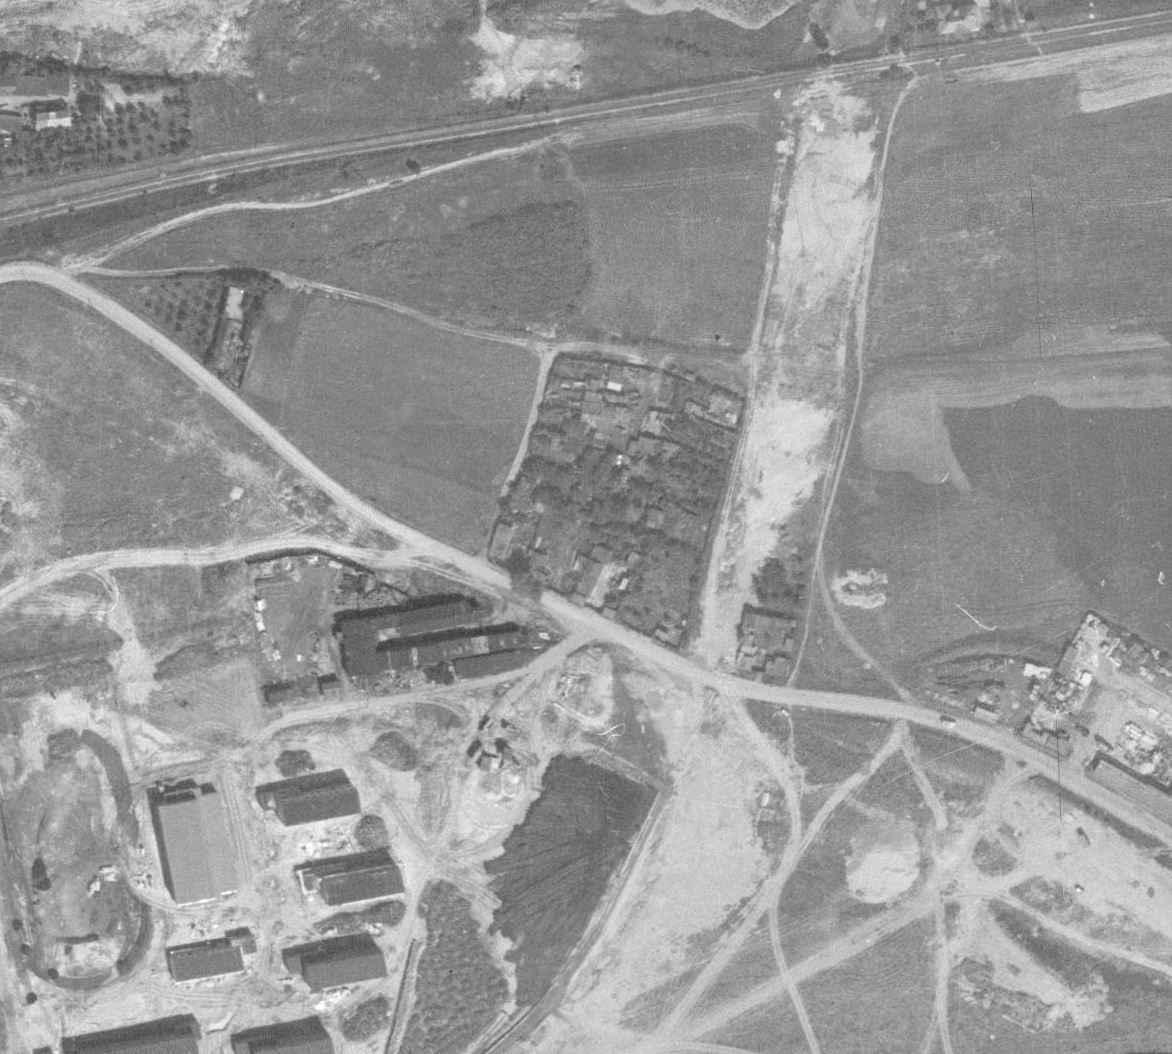 nouzova-kolonie-k-vackovu-letecky-snimek-1966